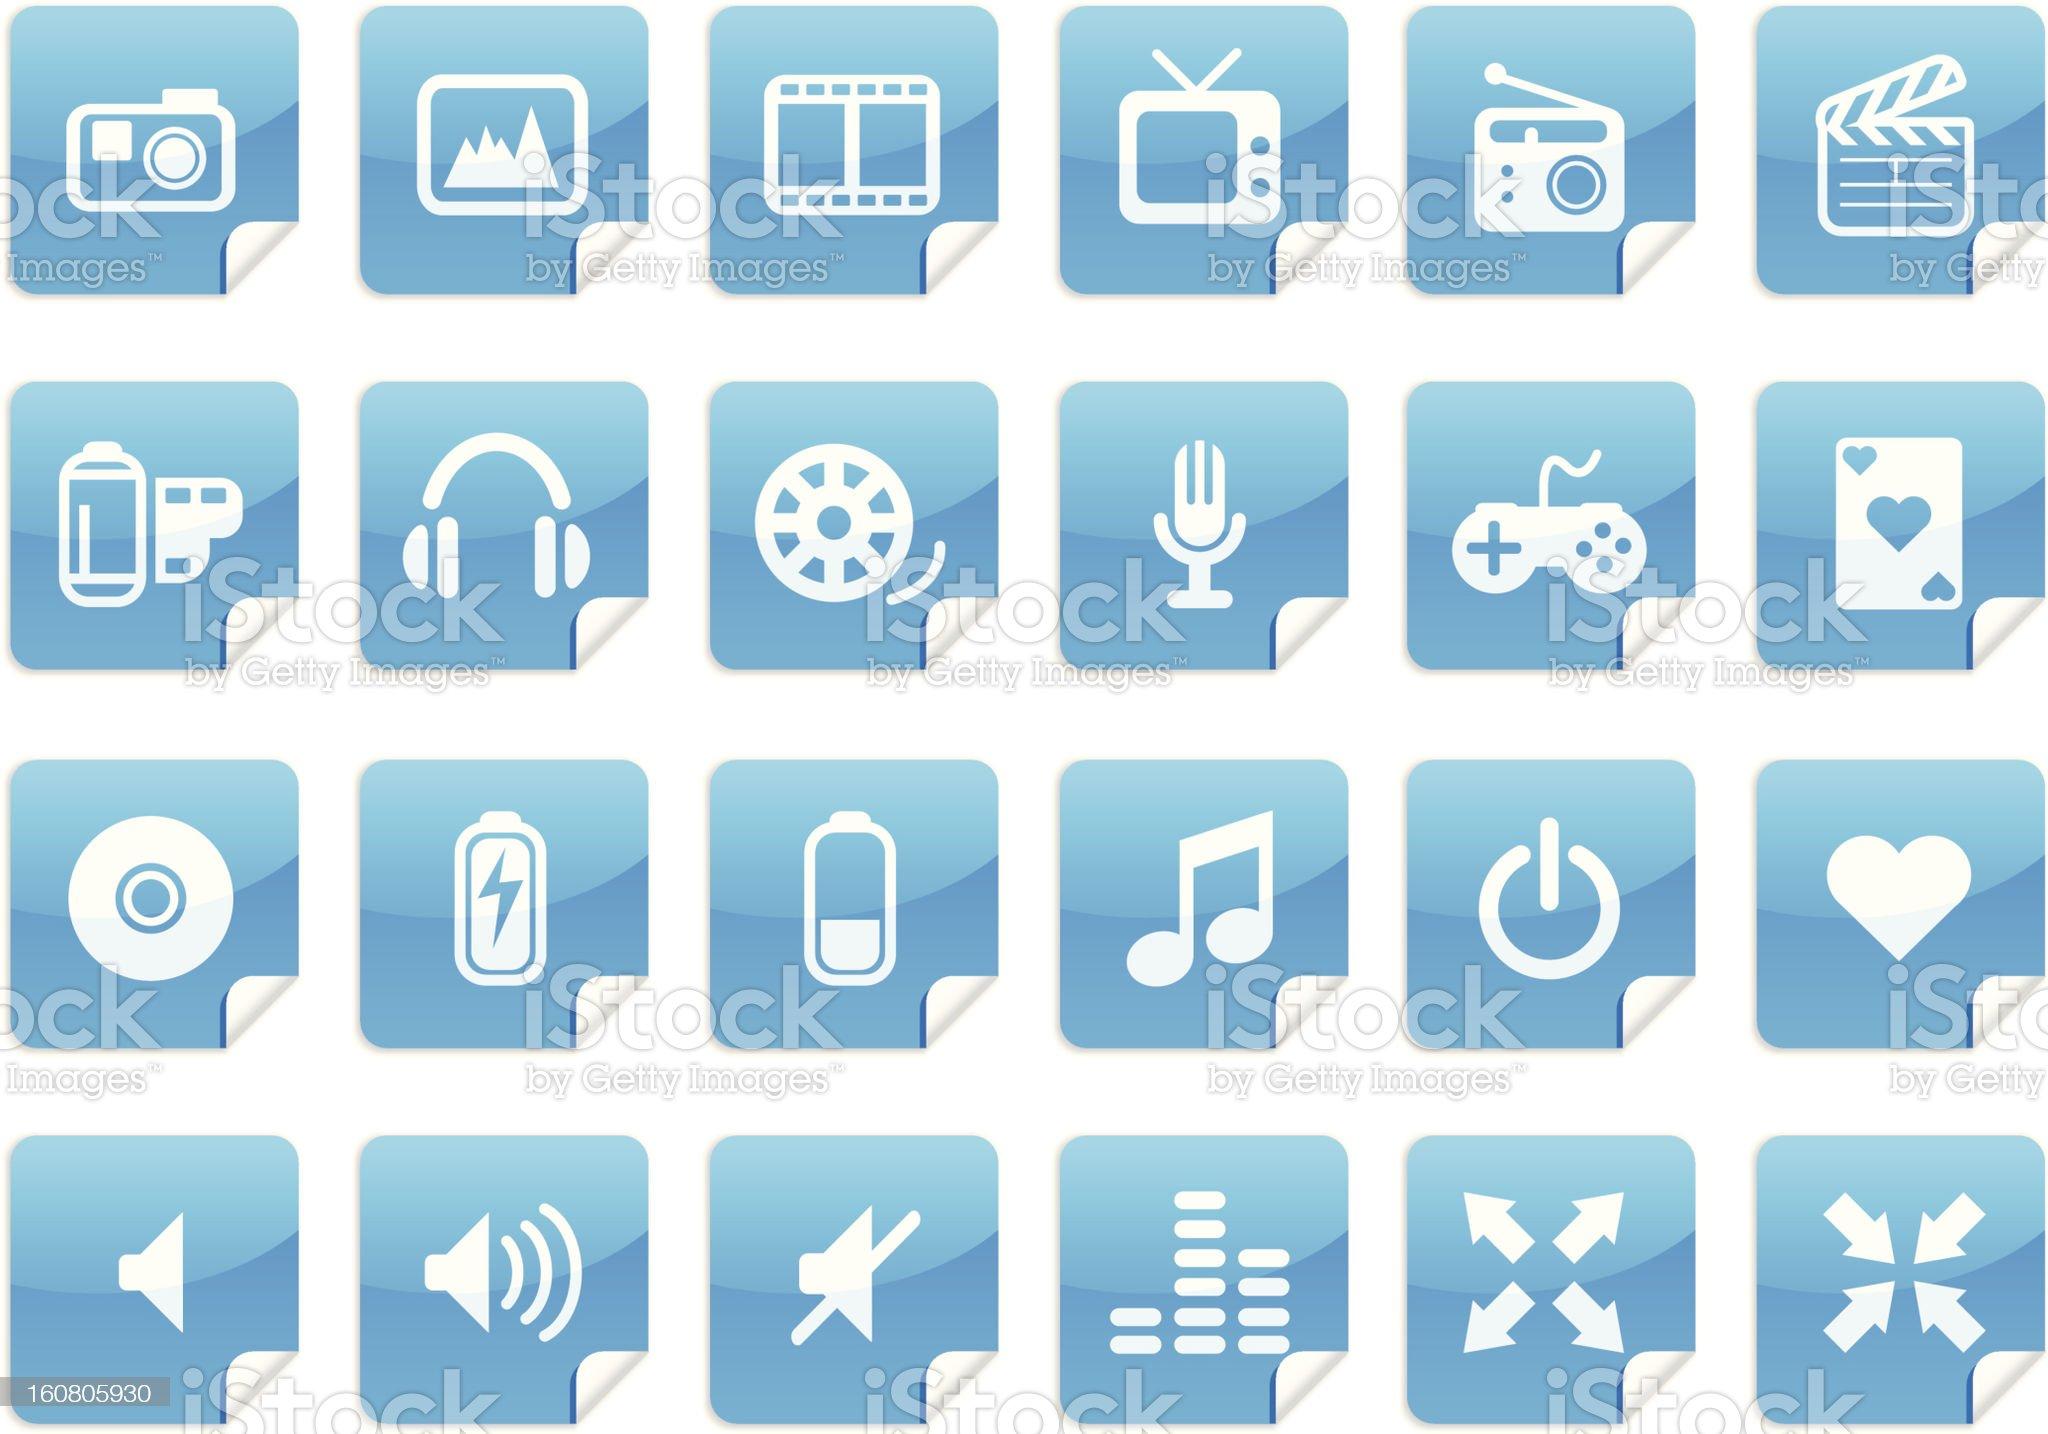 Sticker Multimedia Icons royalty-free stock photo